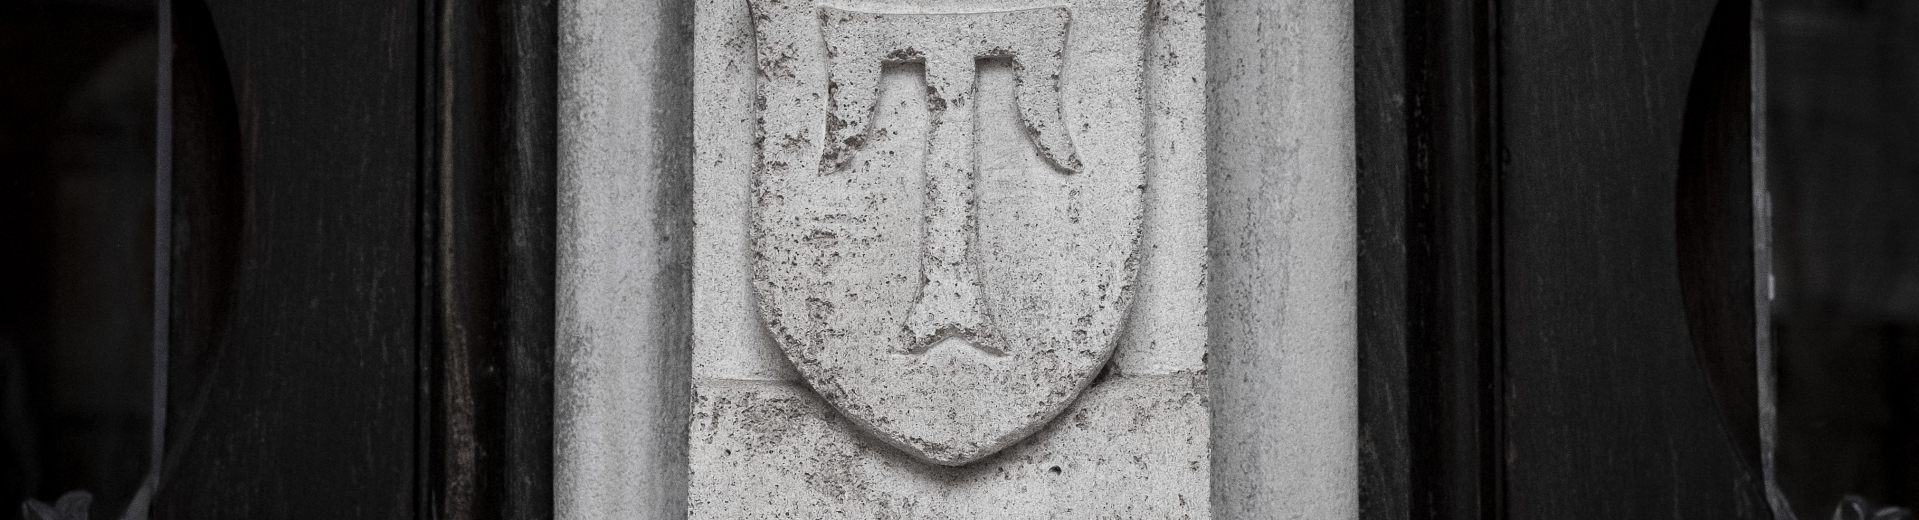 "Historic Temple ""T"" on a stone pillar at Temple University."